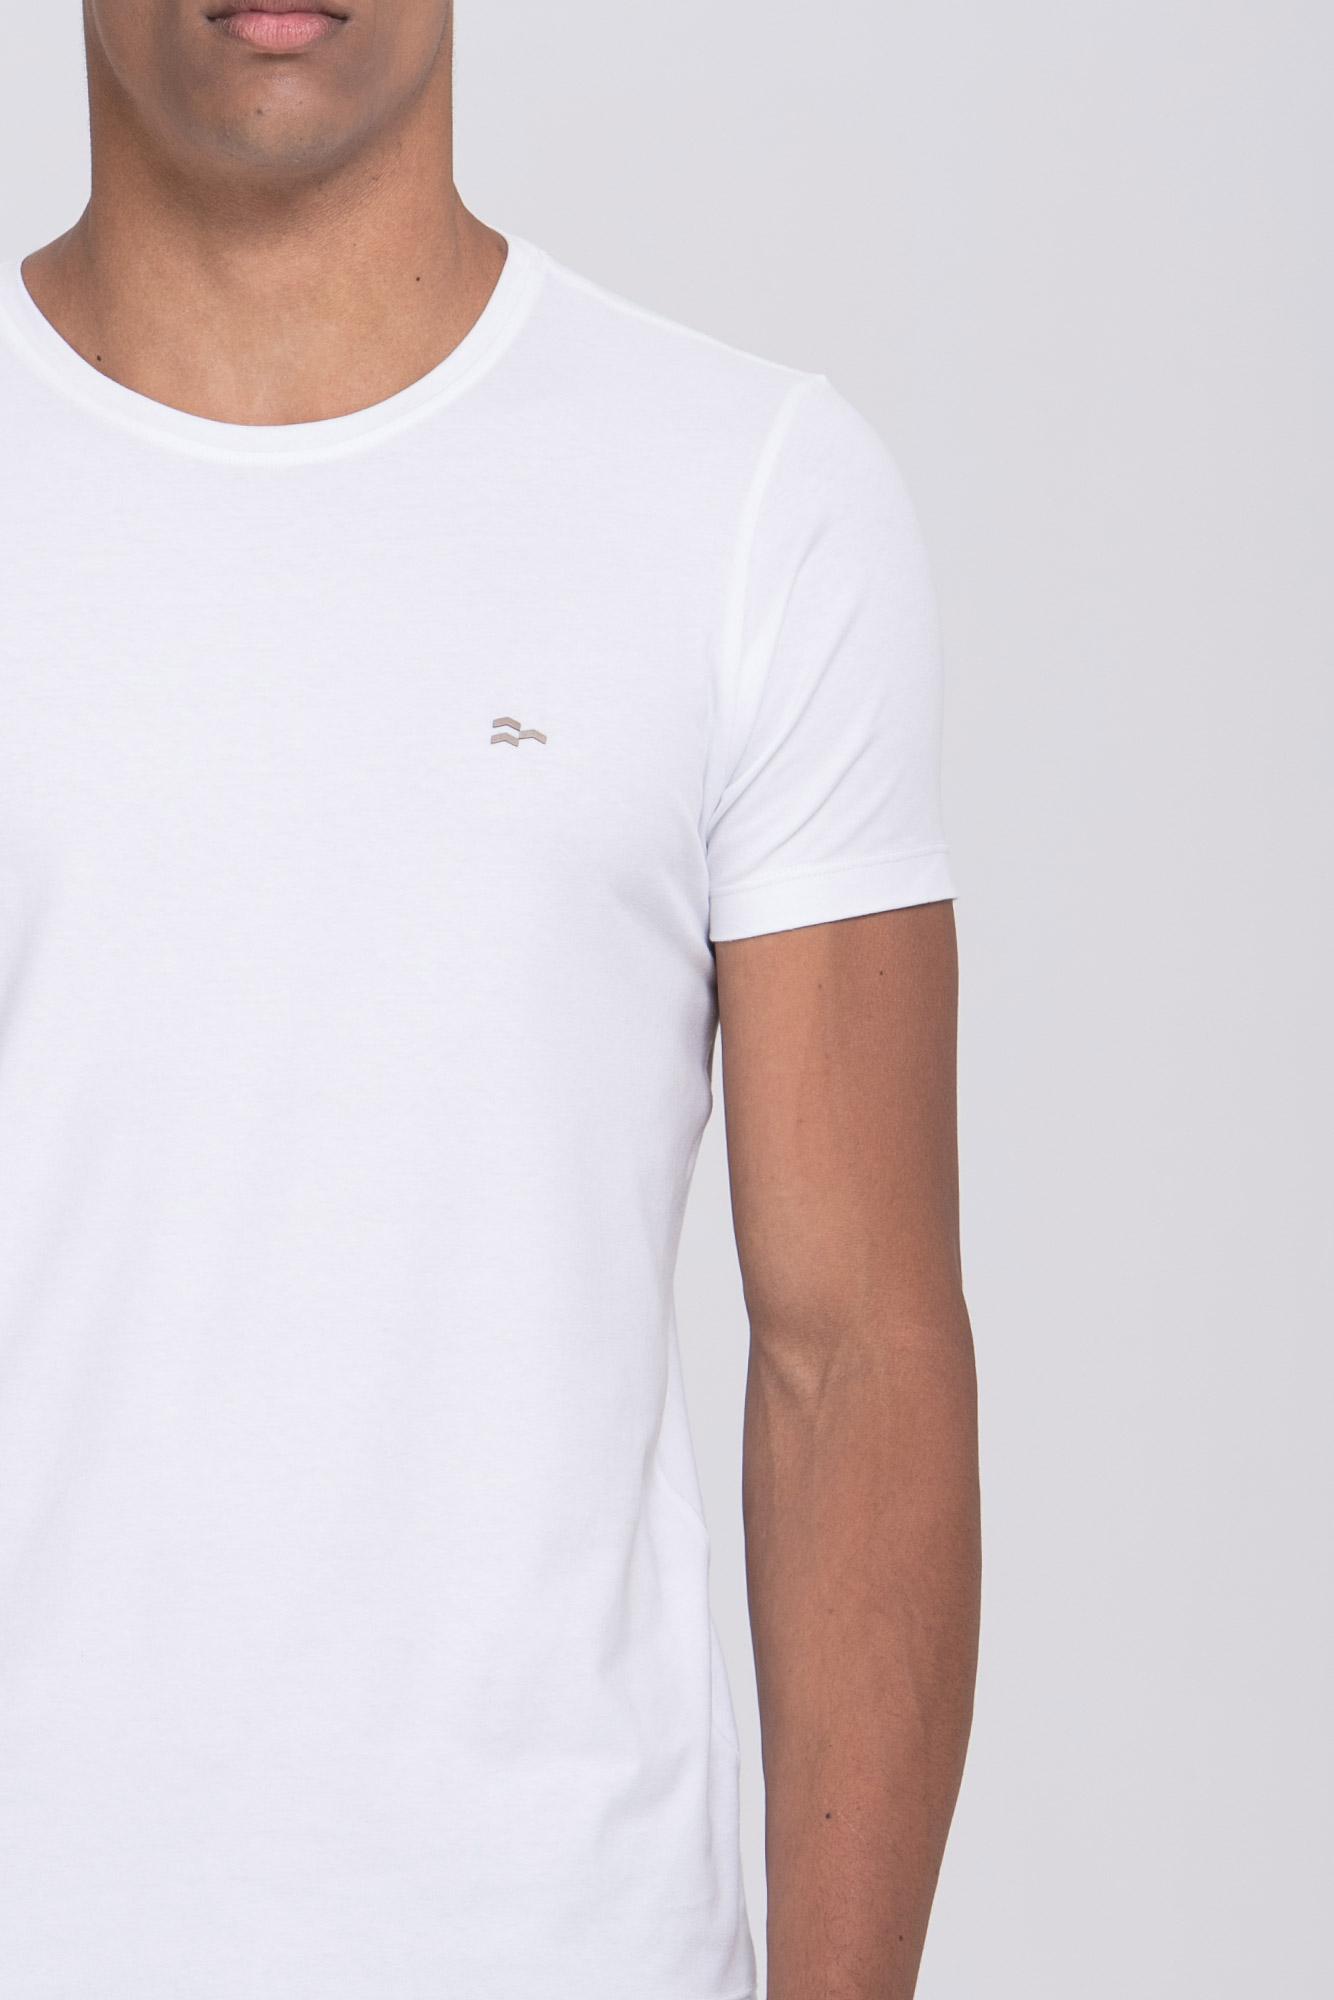 Camiseta Basic Egypt Branco/Marrom